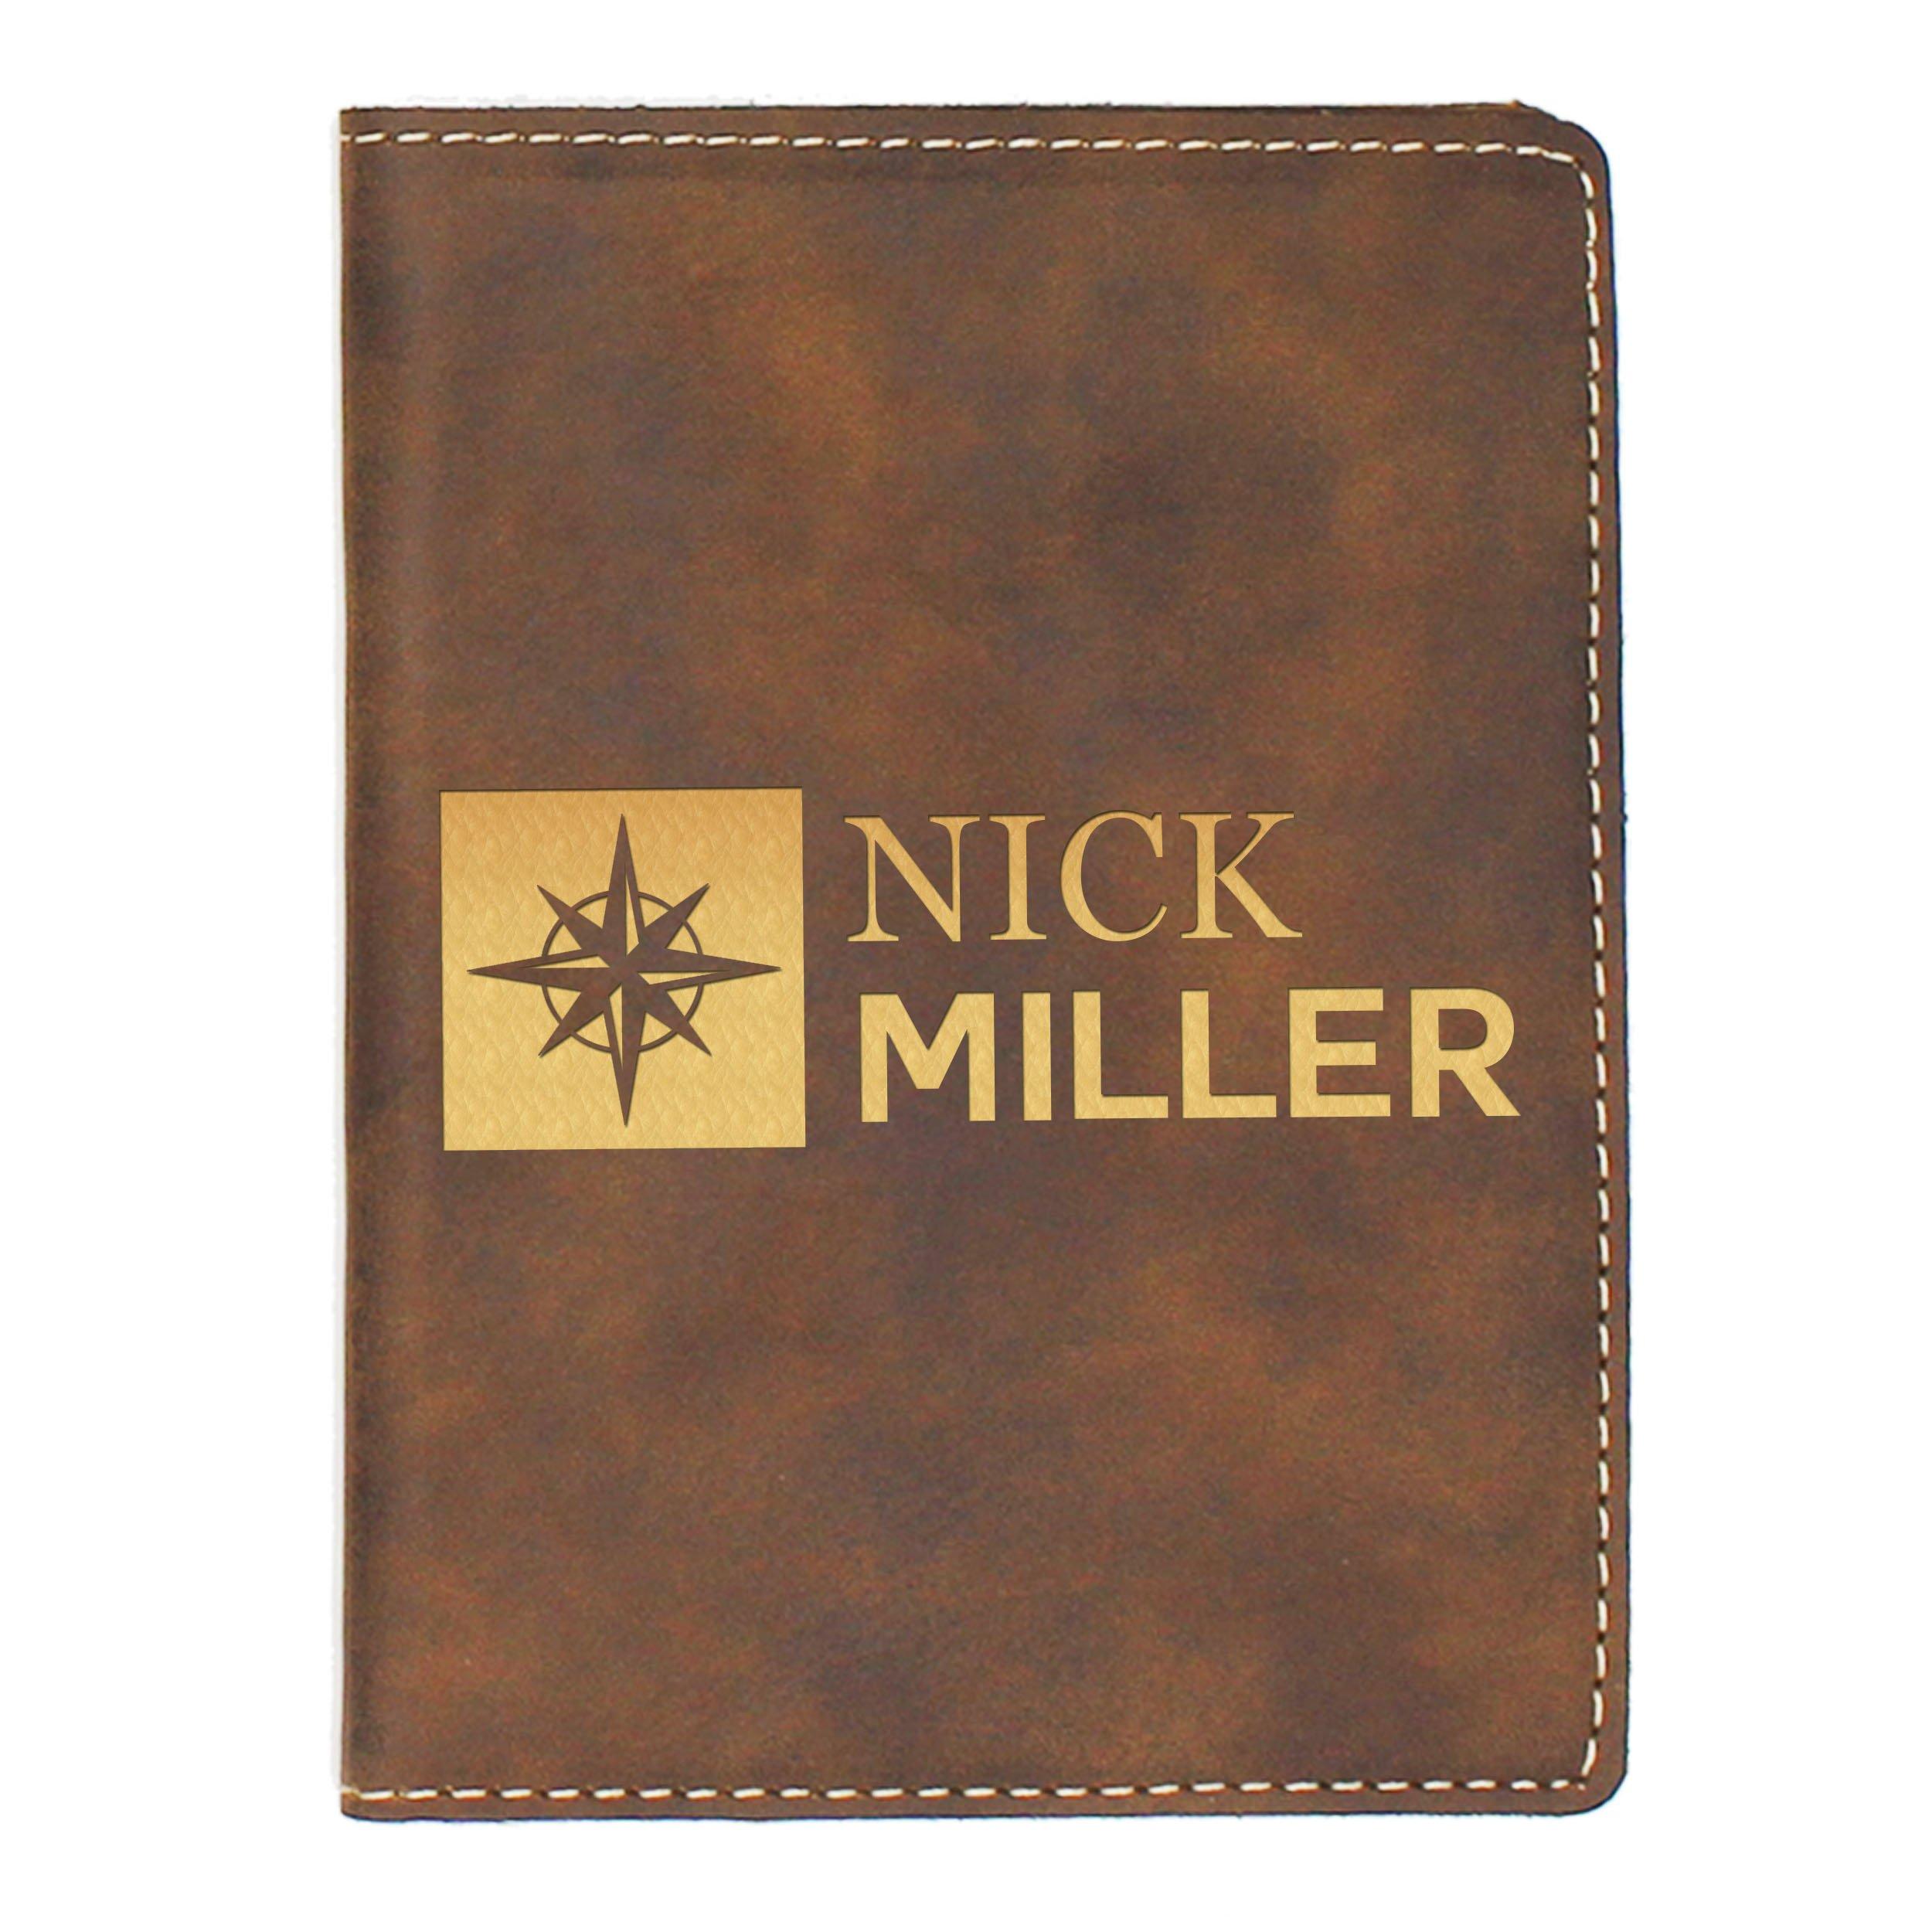 Personalized Passport Cover - Custom Travel Holder - Monogrammed for Free